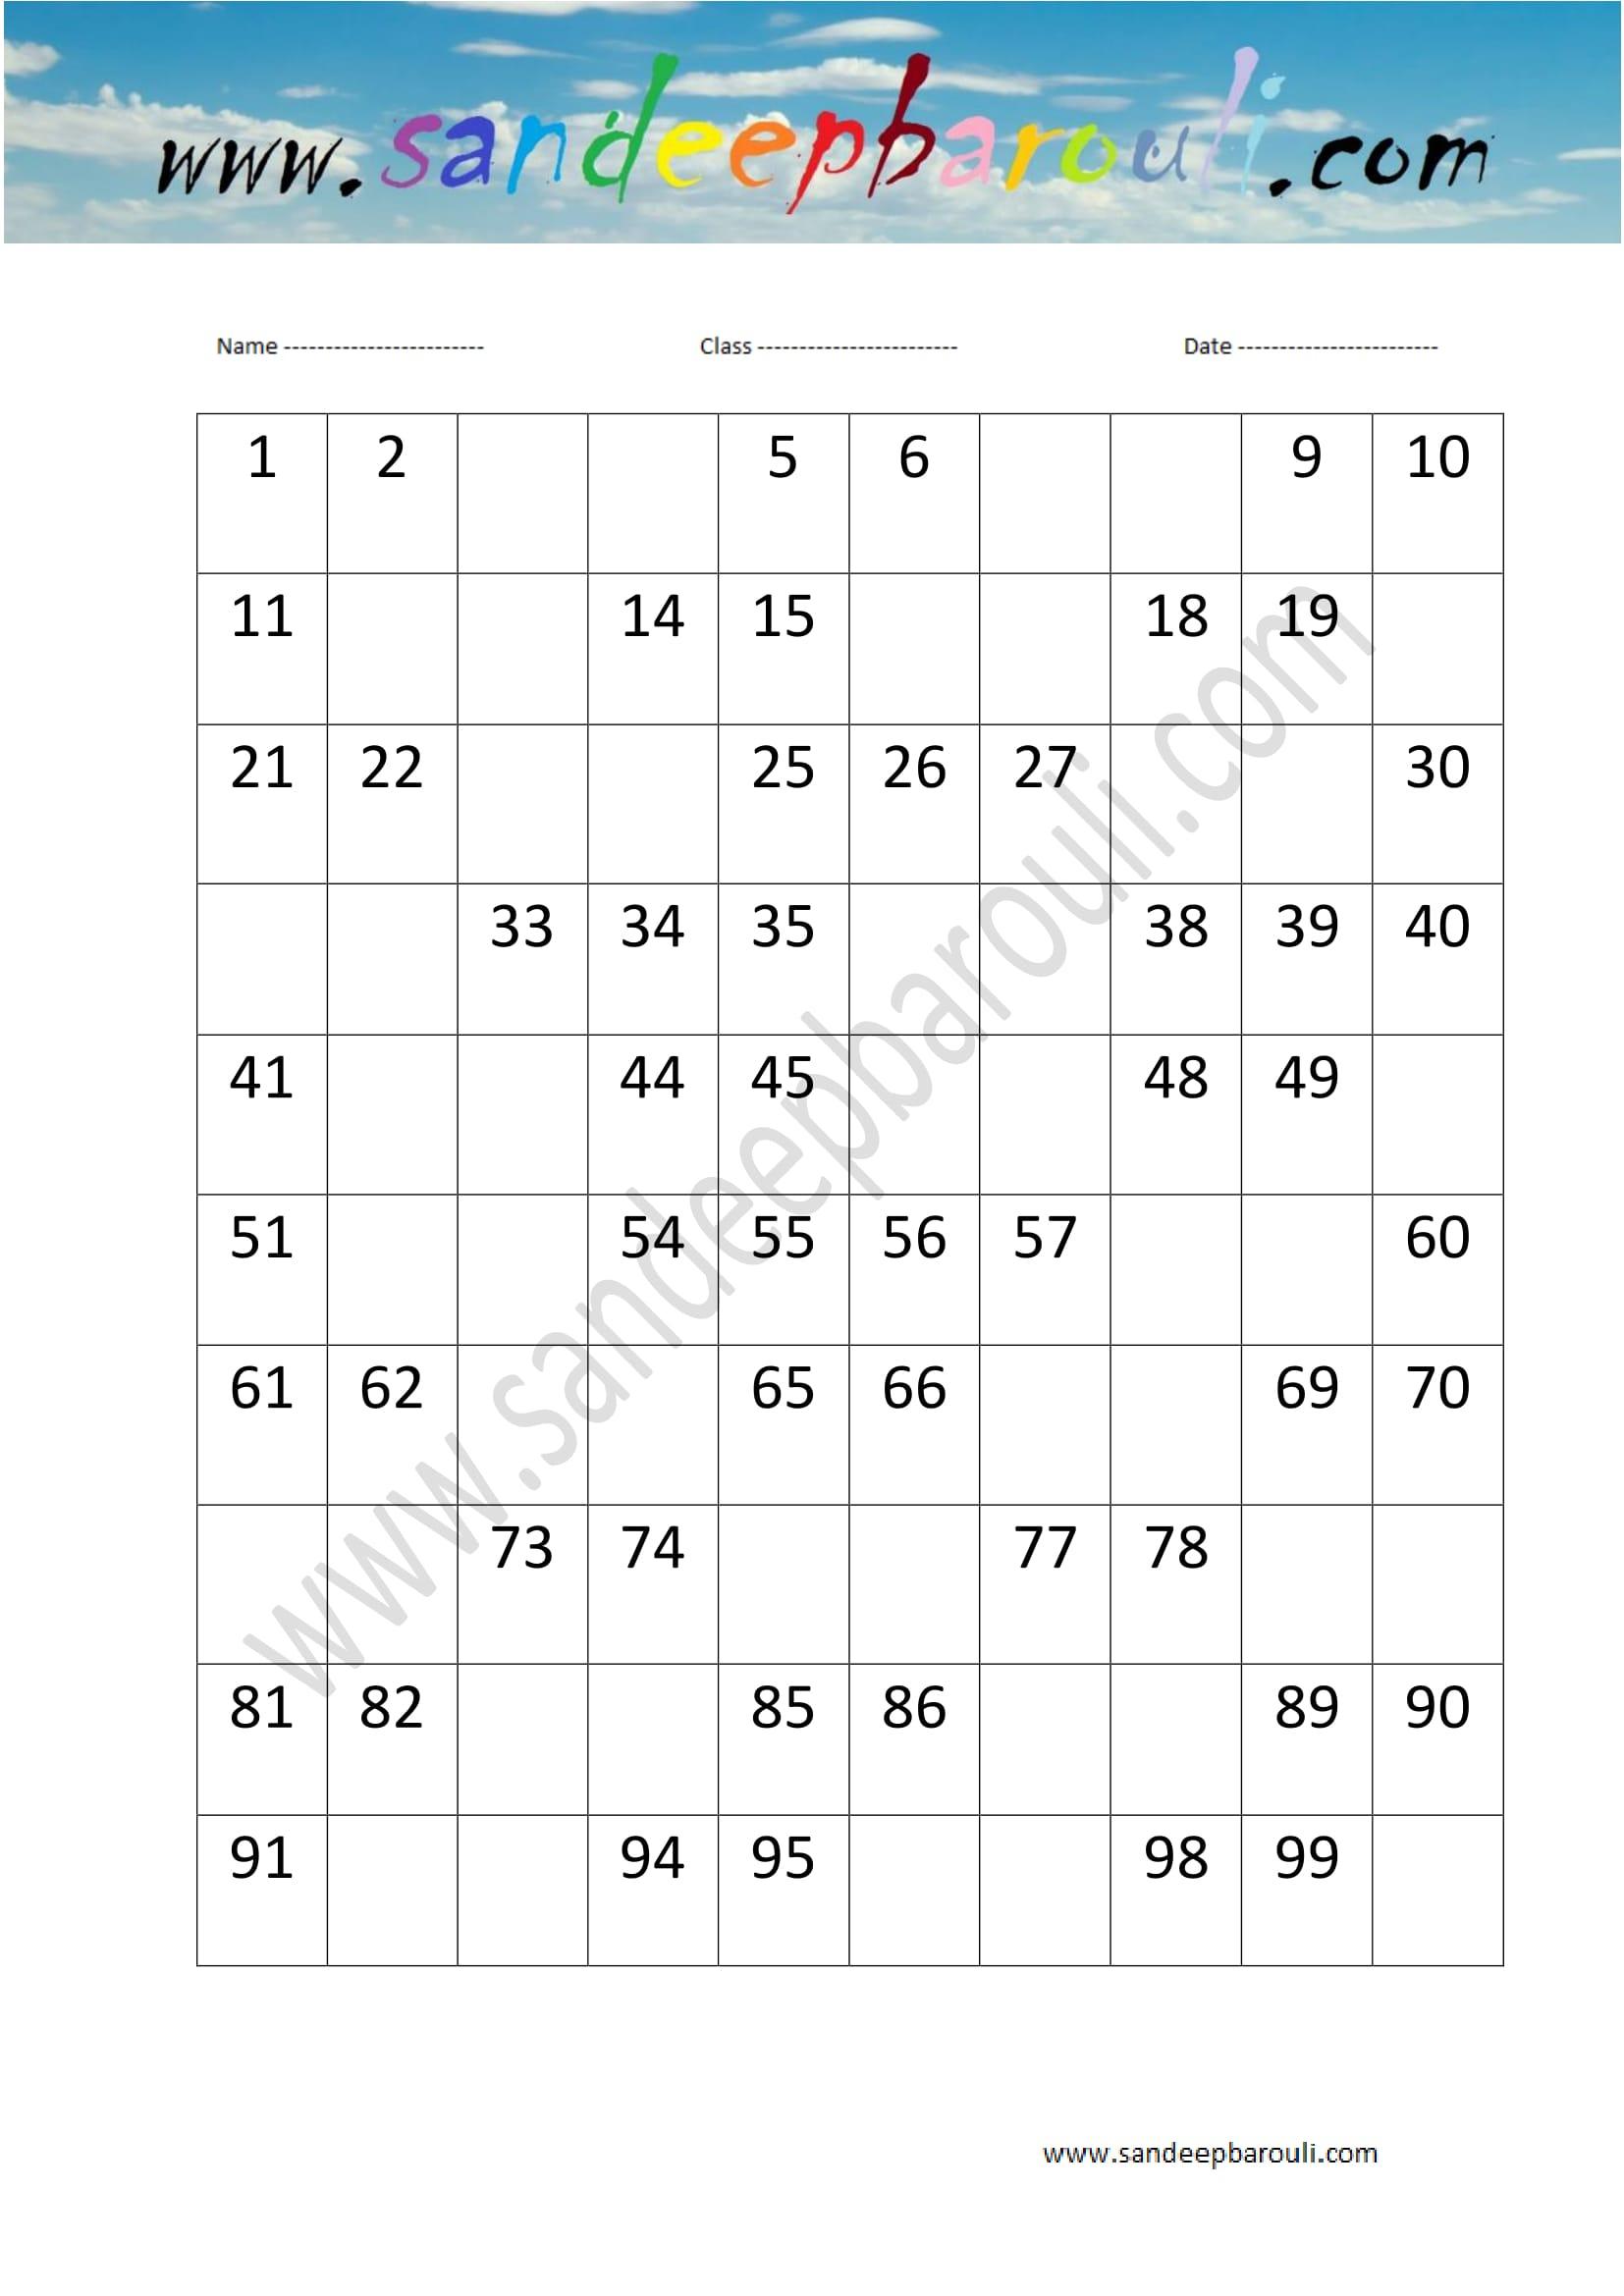 Math Worksheets For Kids 56 Sandeepbarouli